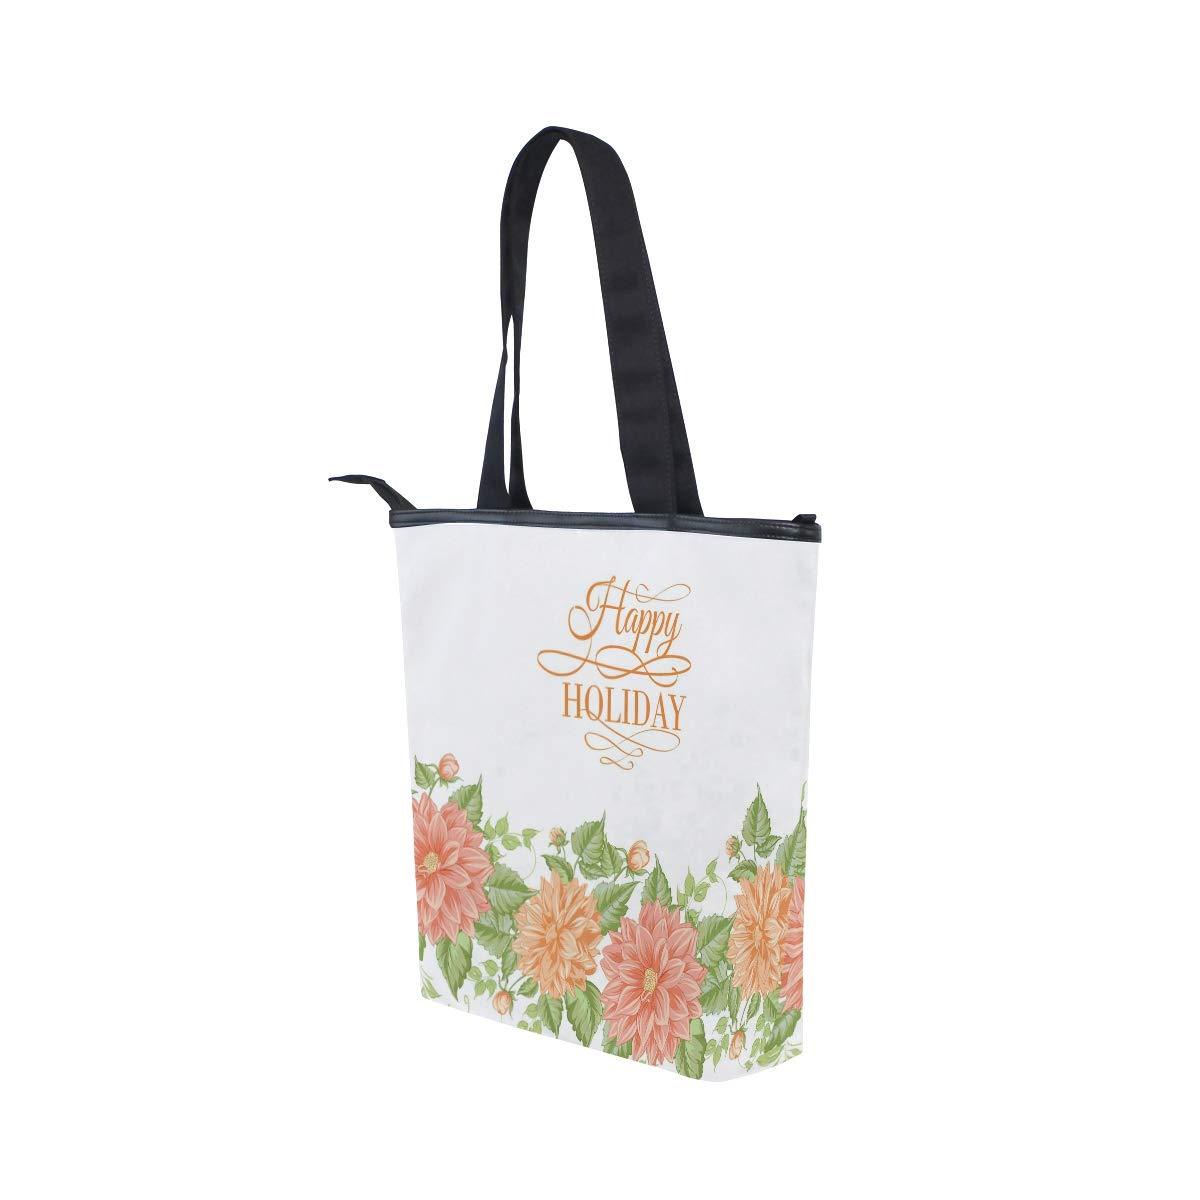 Womens Canvas Tote Bags Baseball Men Watercolor Print Top Handbags Casual Shoulder Travel Bag with Zipper